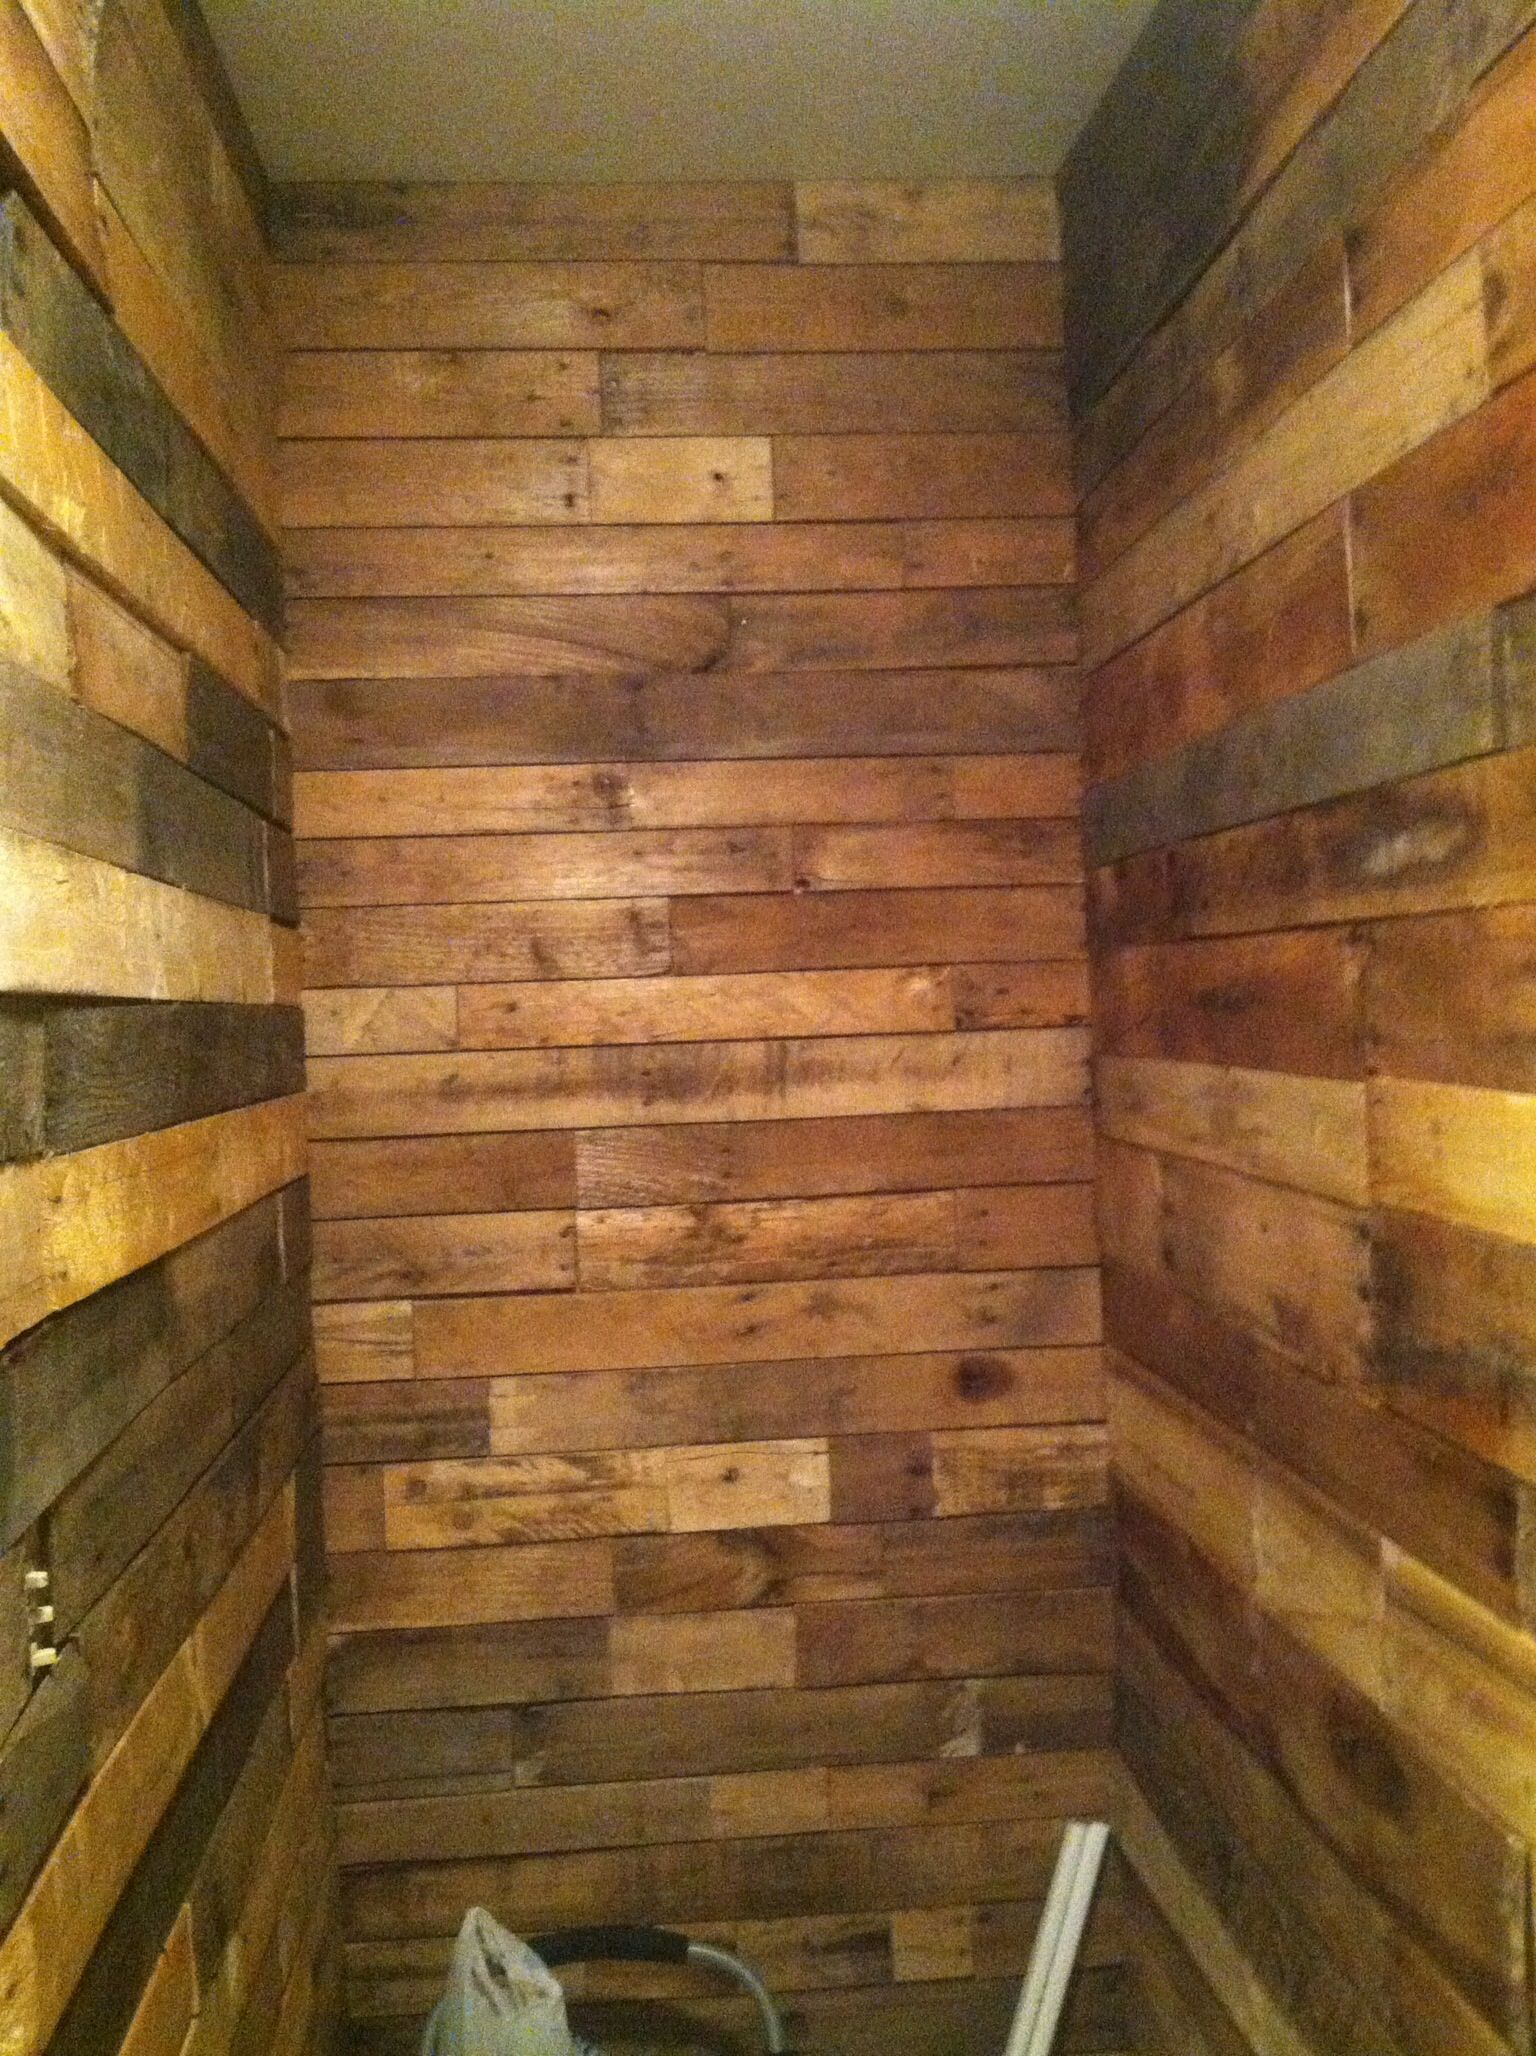 Used repurpose pallet wood | Repurpose pallets, Wood ...